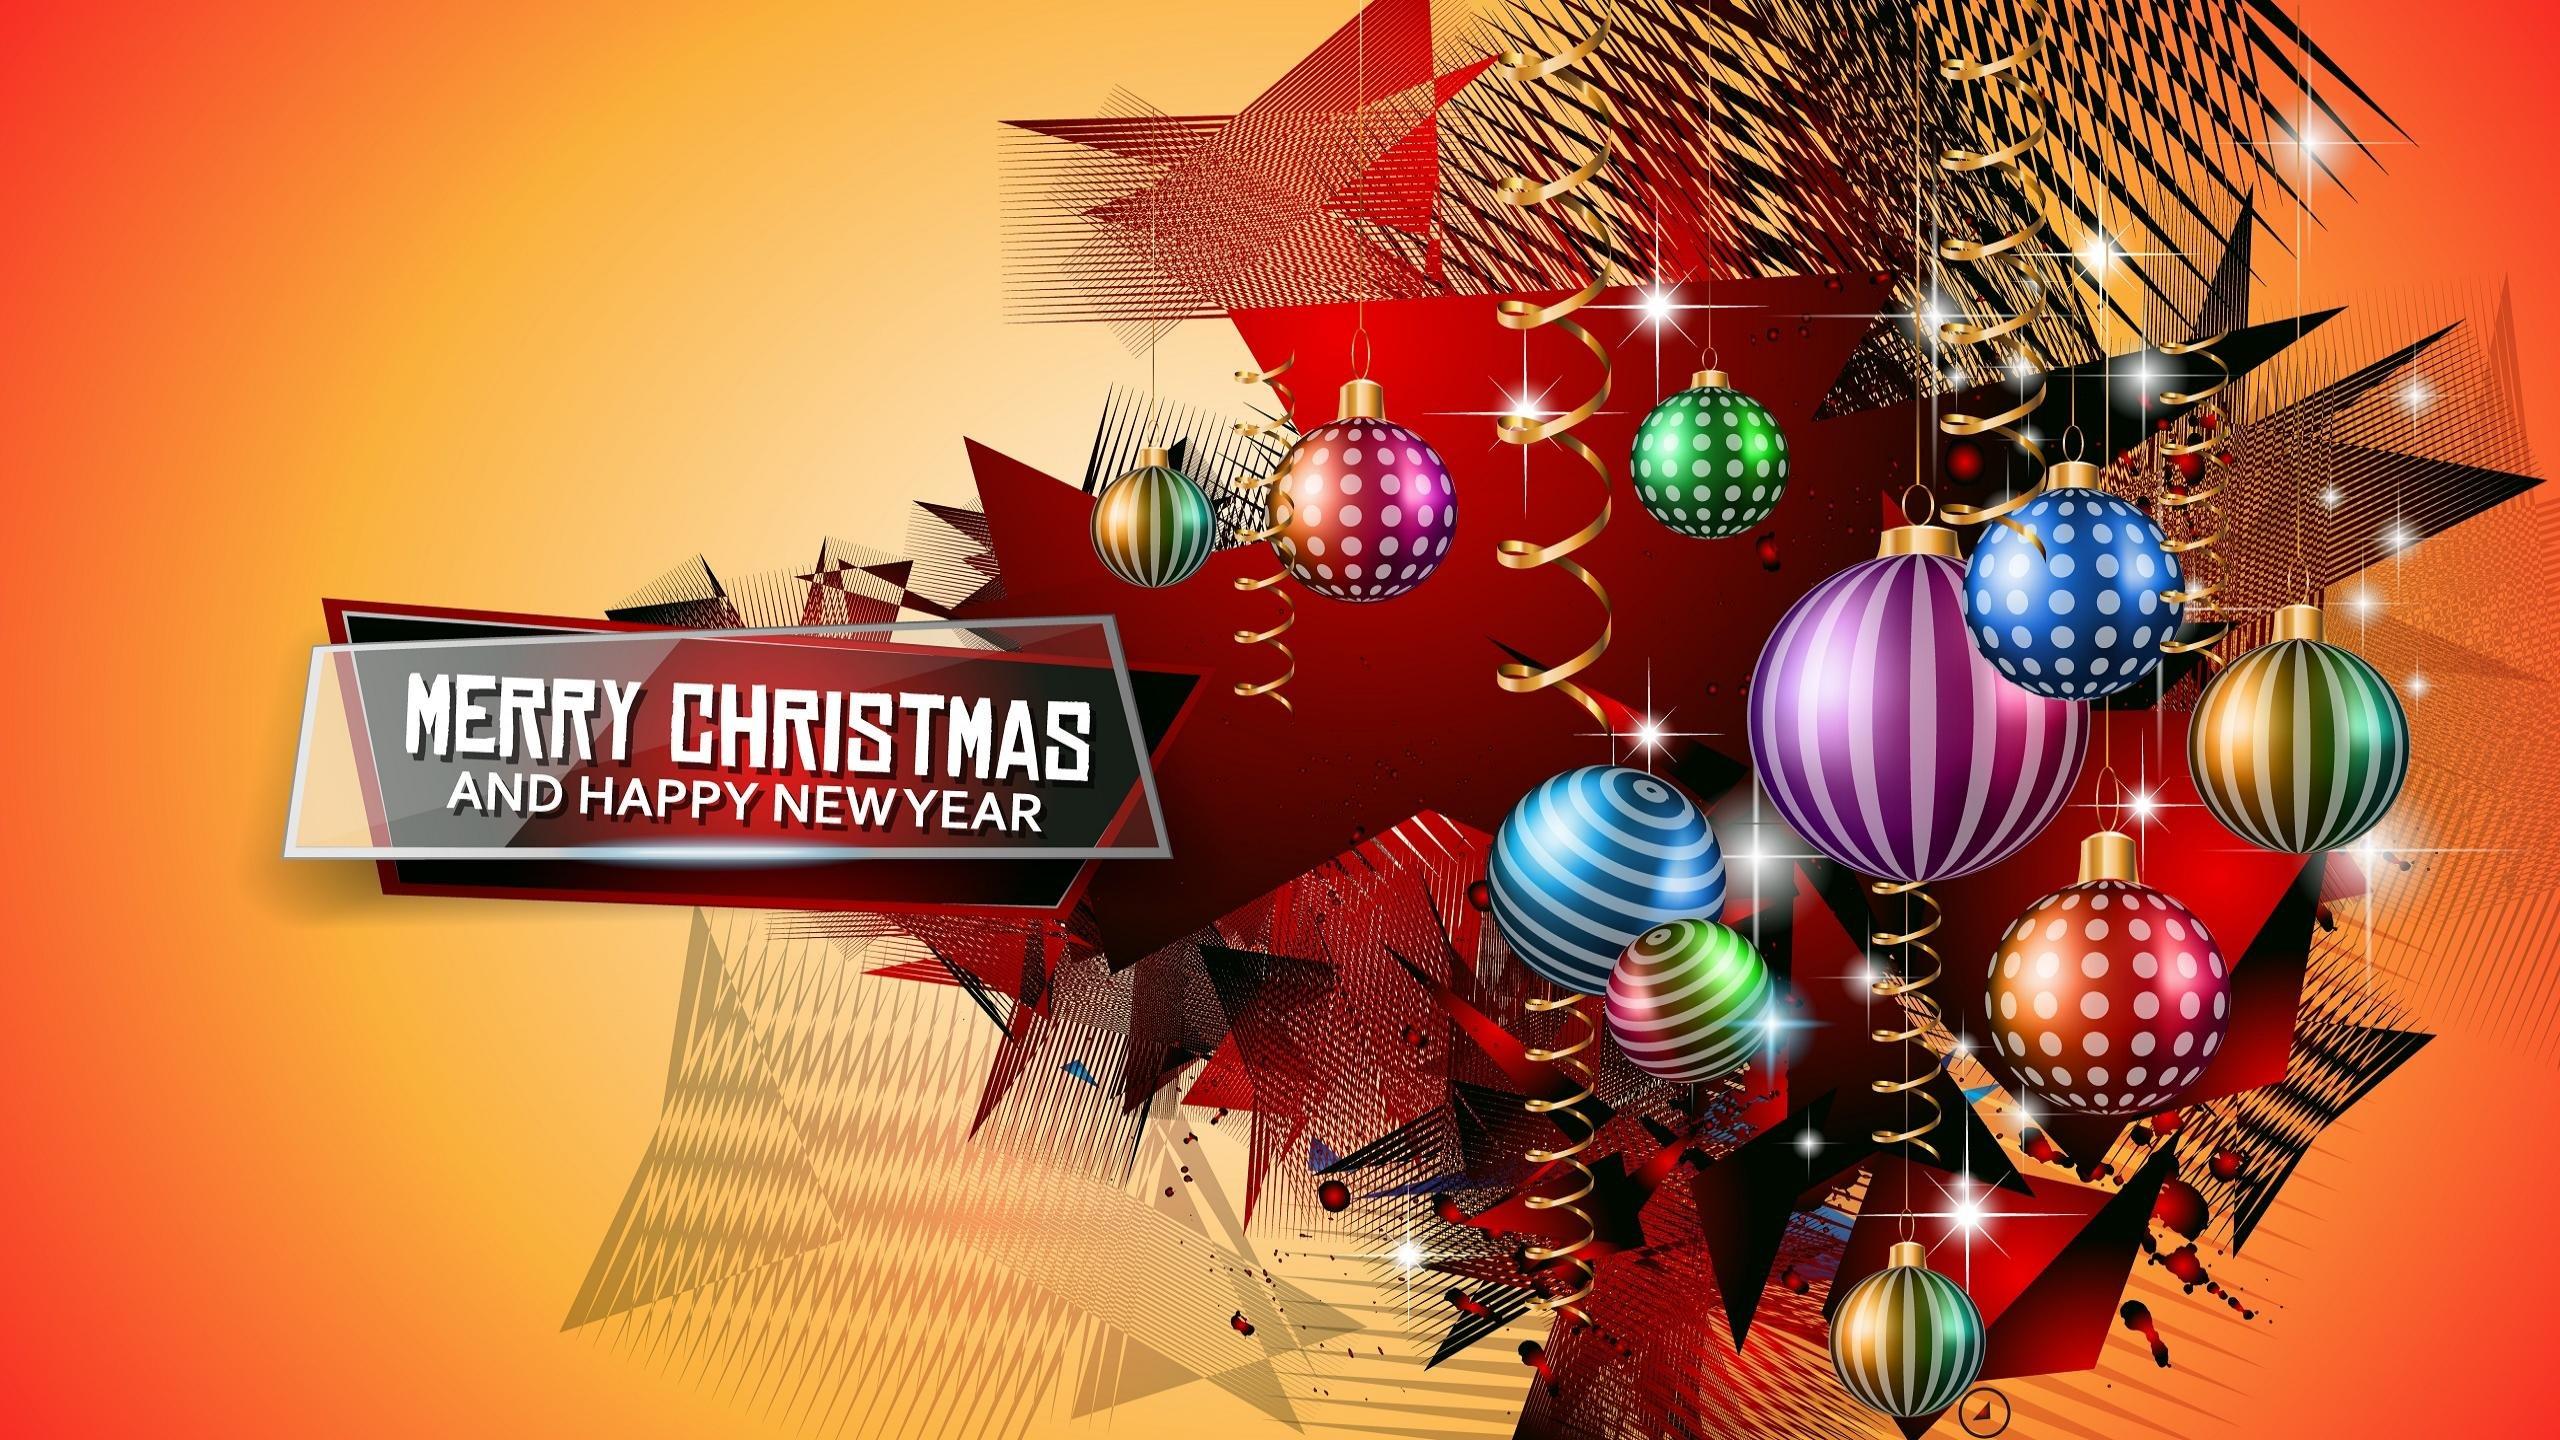 Free Download Christmas Ornaments Decorations Background Idx1440 For Desktop